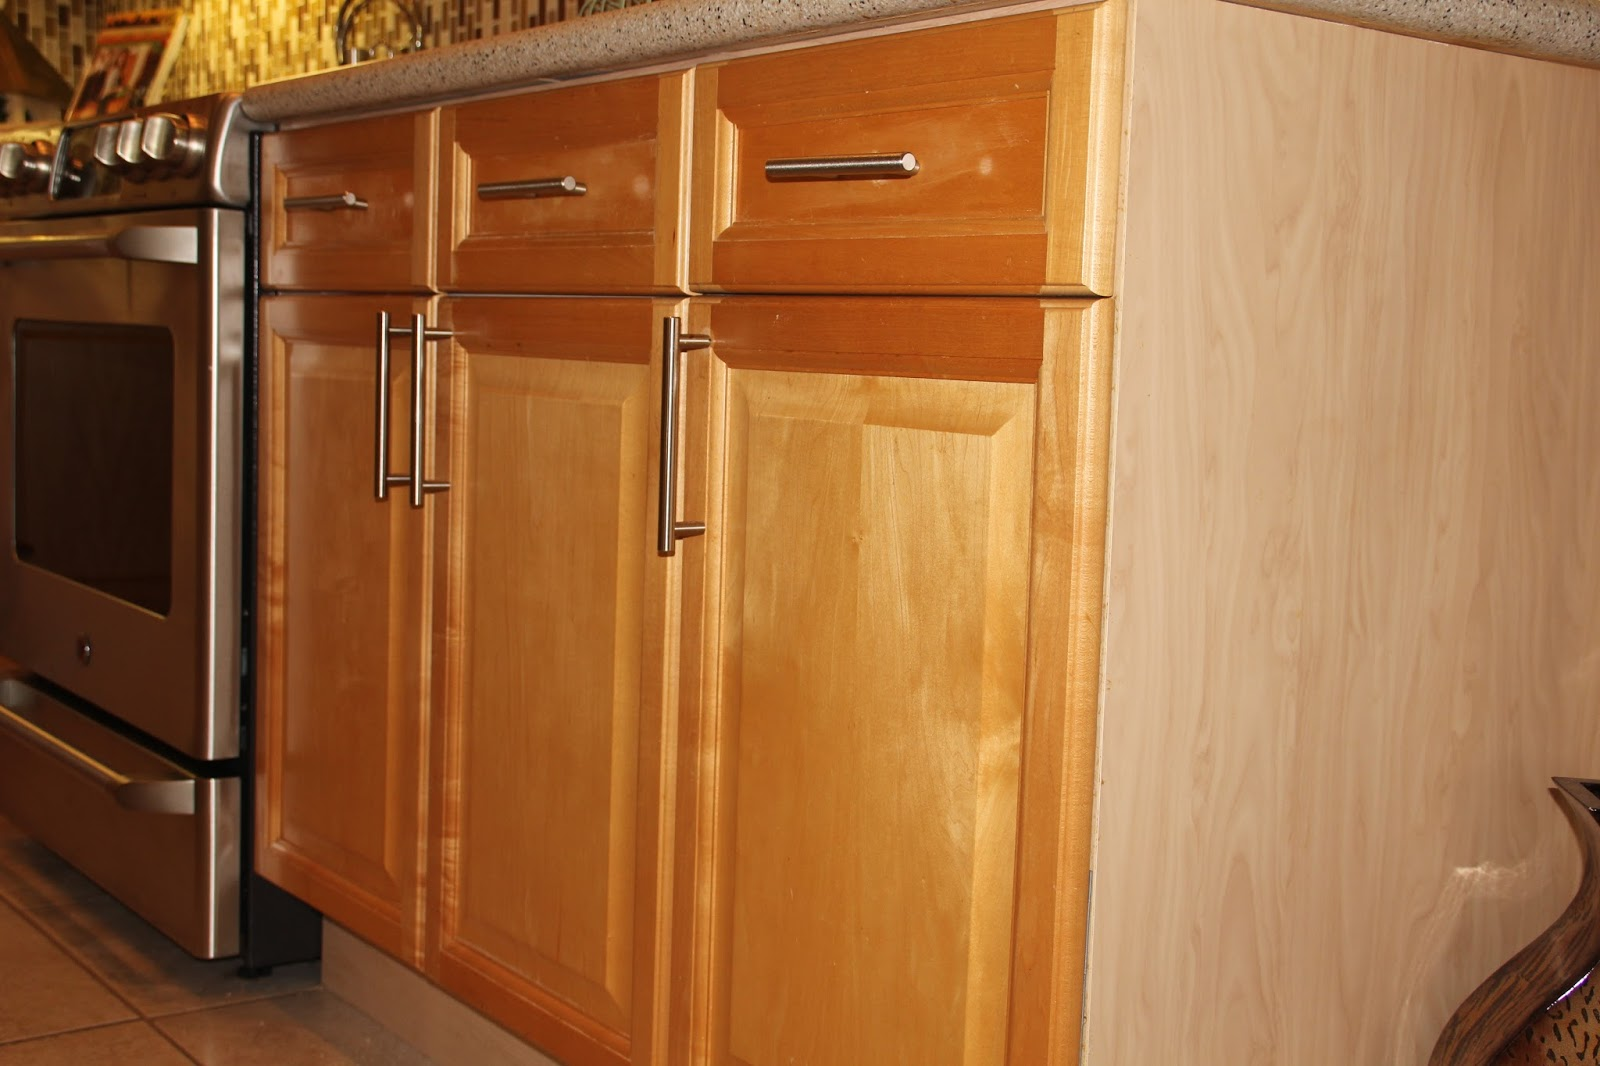 re laminate kitchen cabinets 28 images laminate kitchen cabinets laminate kitchen cabinet